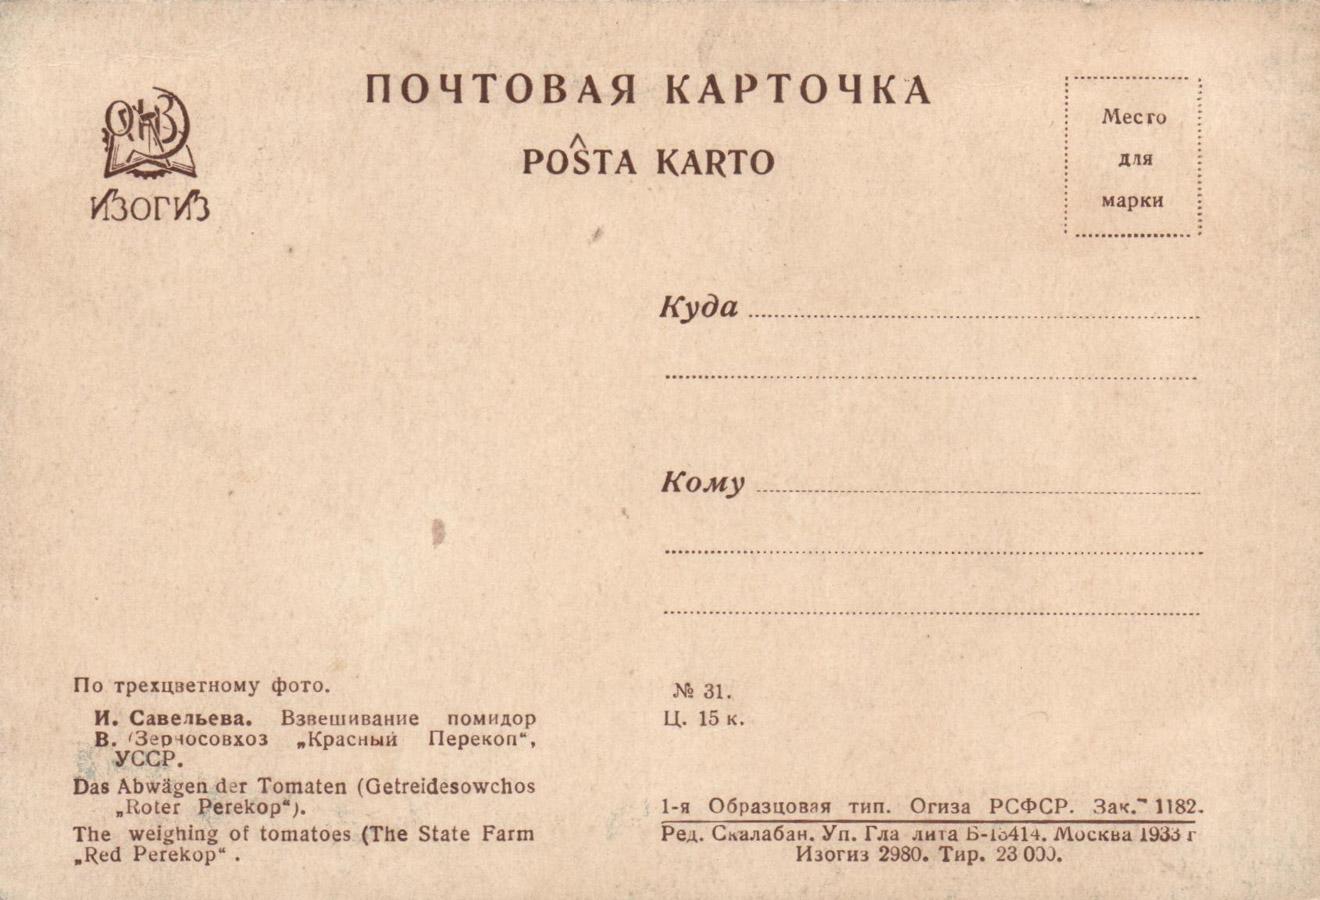 1933 Взвешивание помидор2